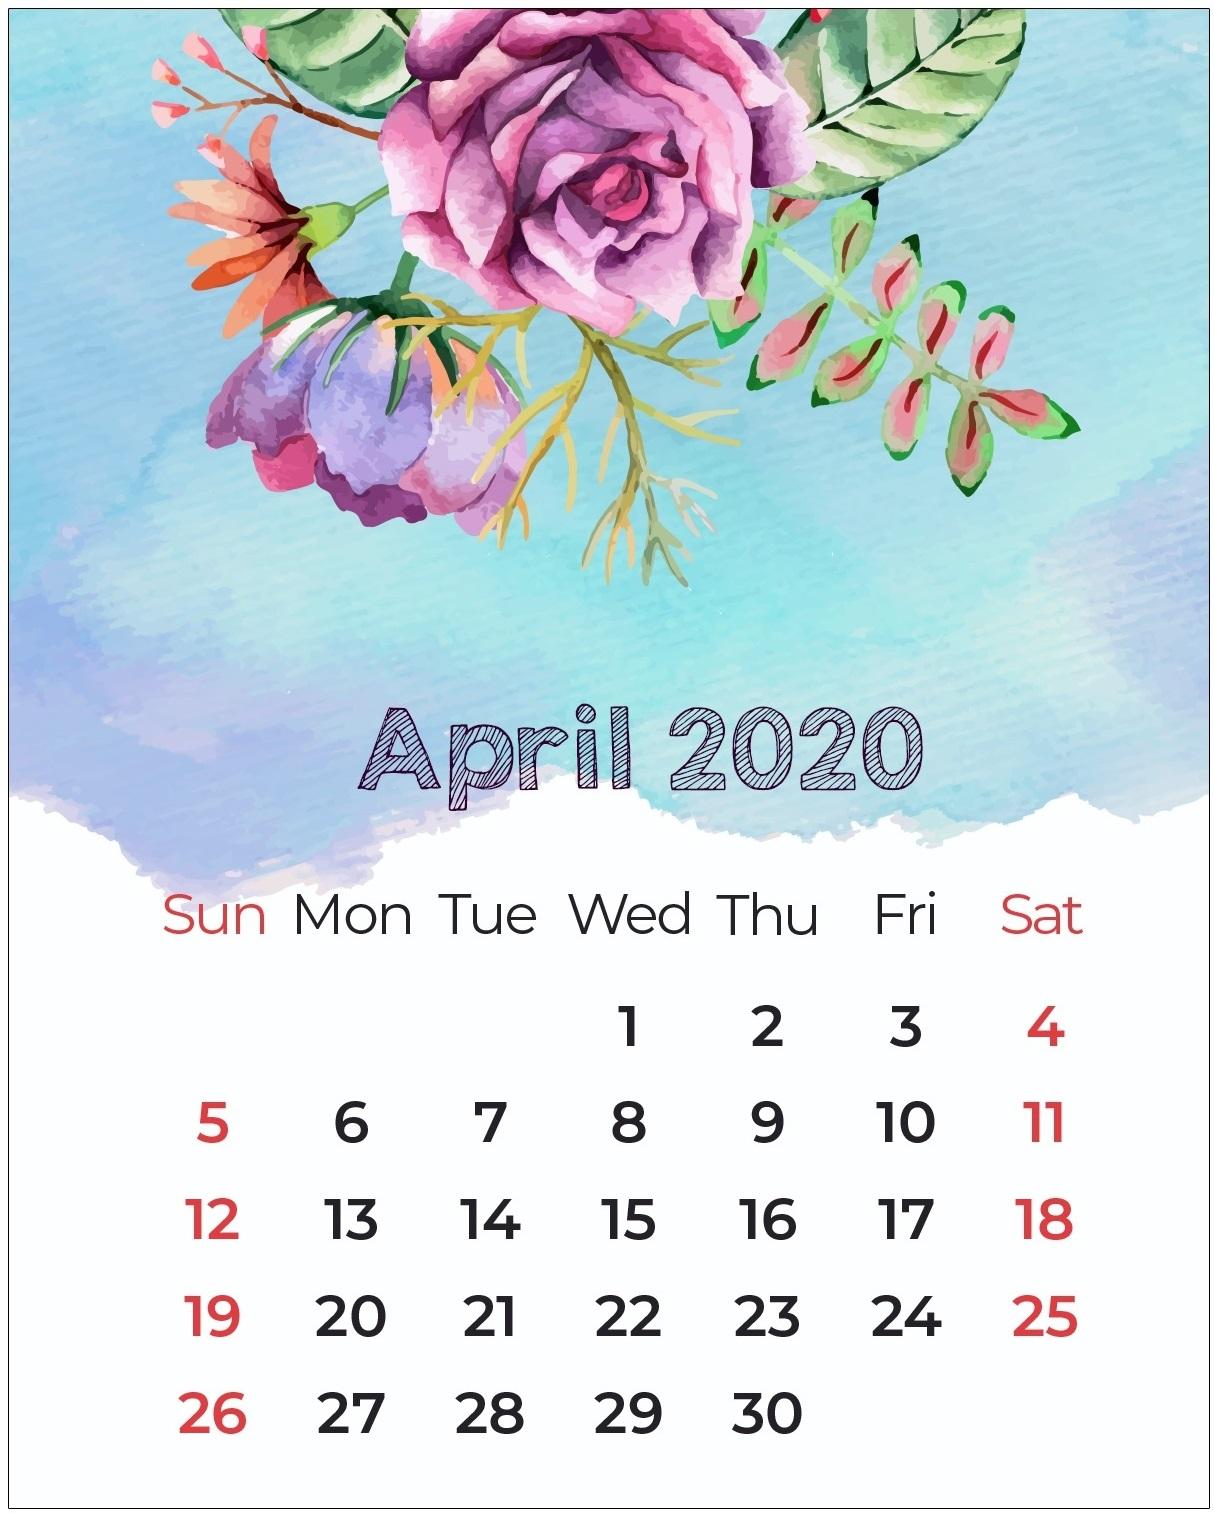 Floral April 2020 Wall Calendar Template